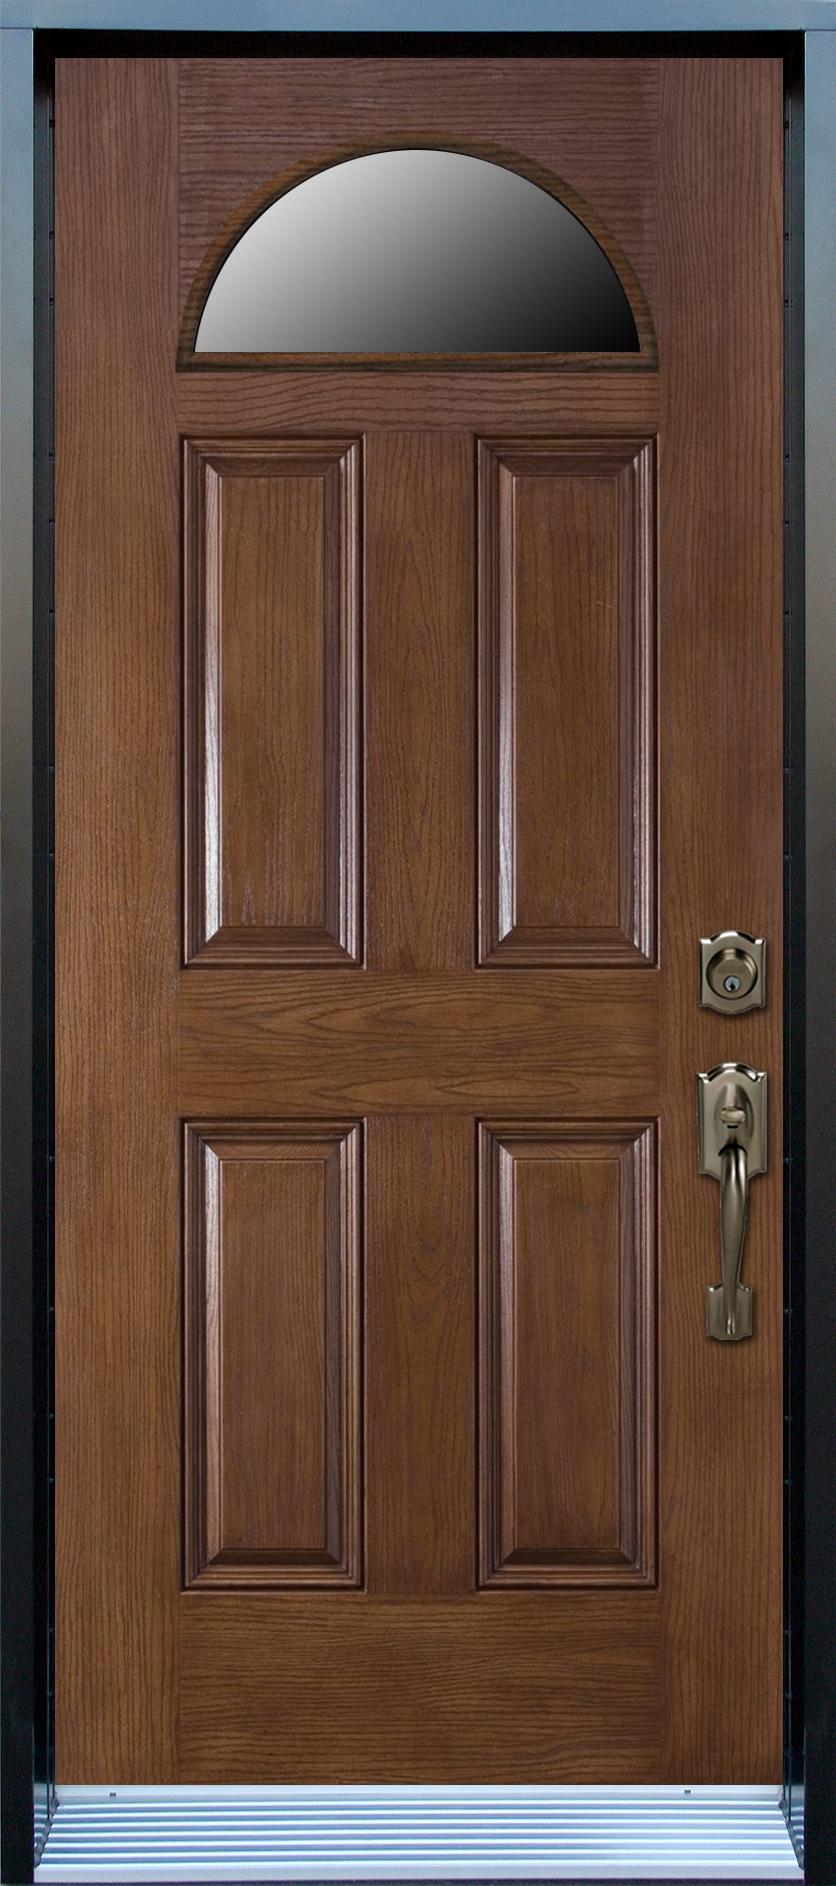 Mod le porte fibre de verre avec unit vitr e pa27 - Porte verre de bar ...